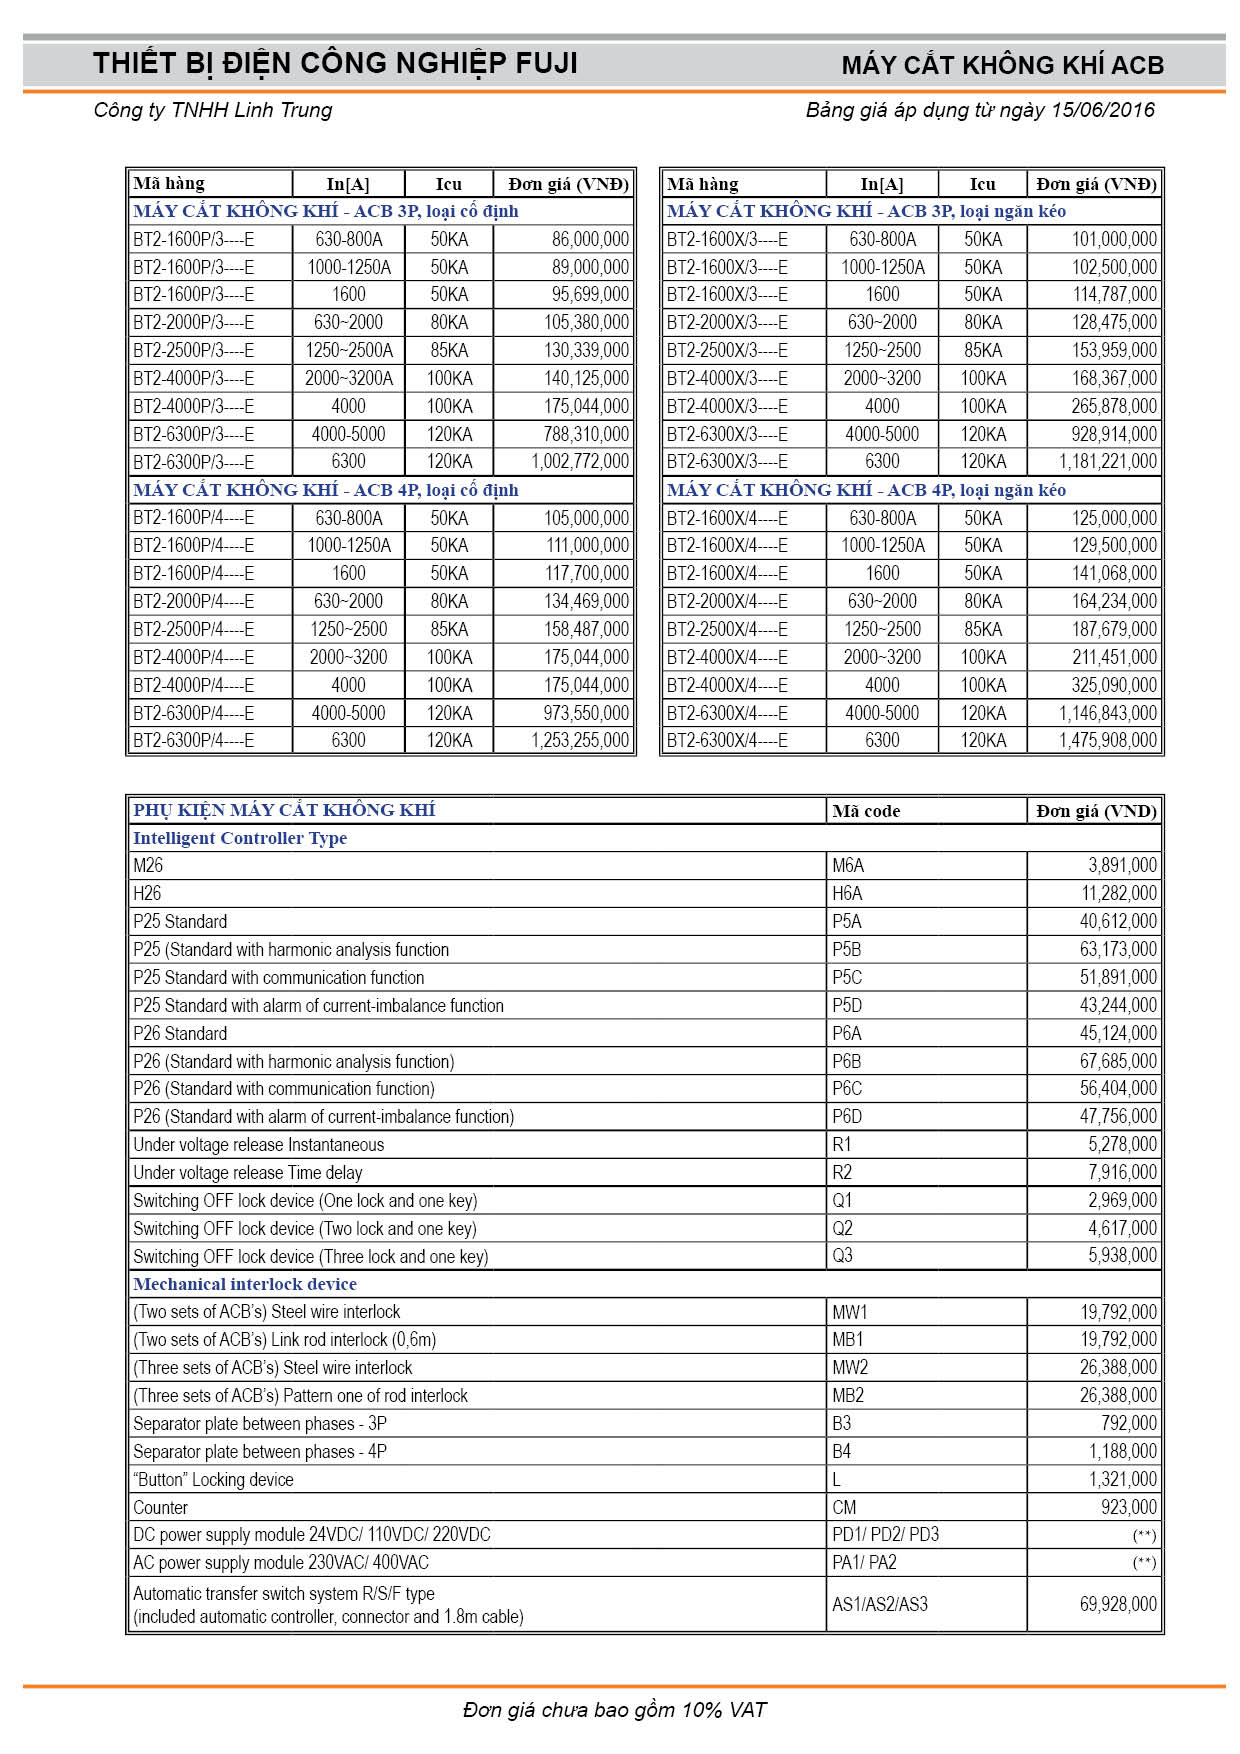 Bảng giá ACB Fuji, ACB BT2 Fuji